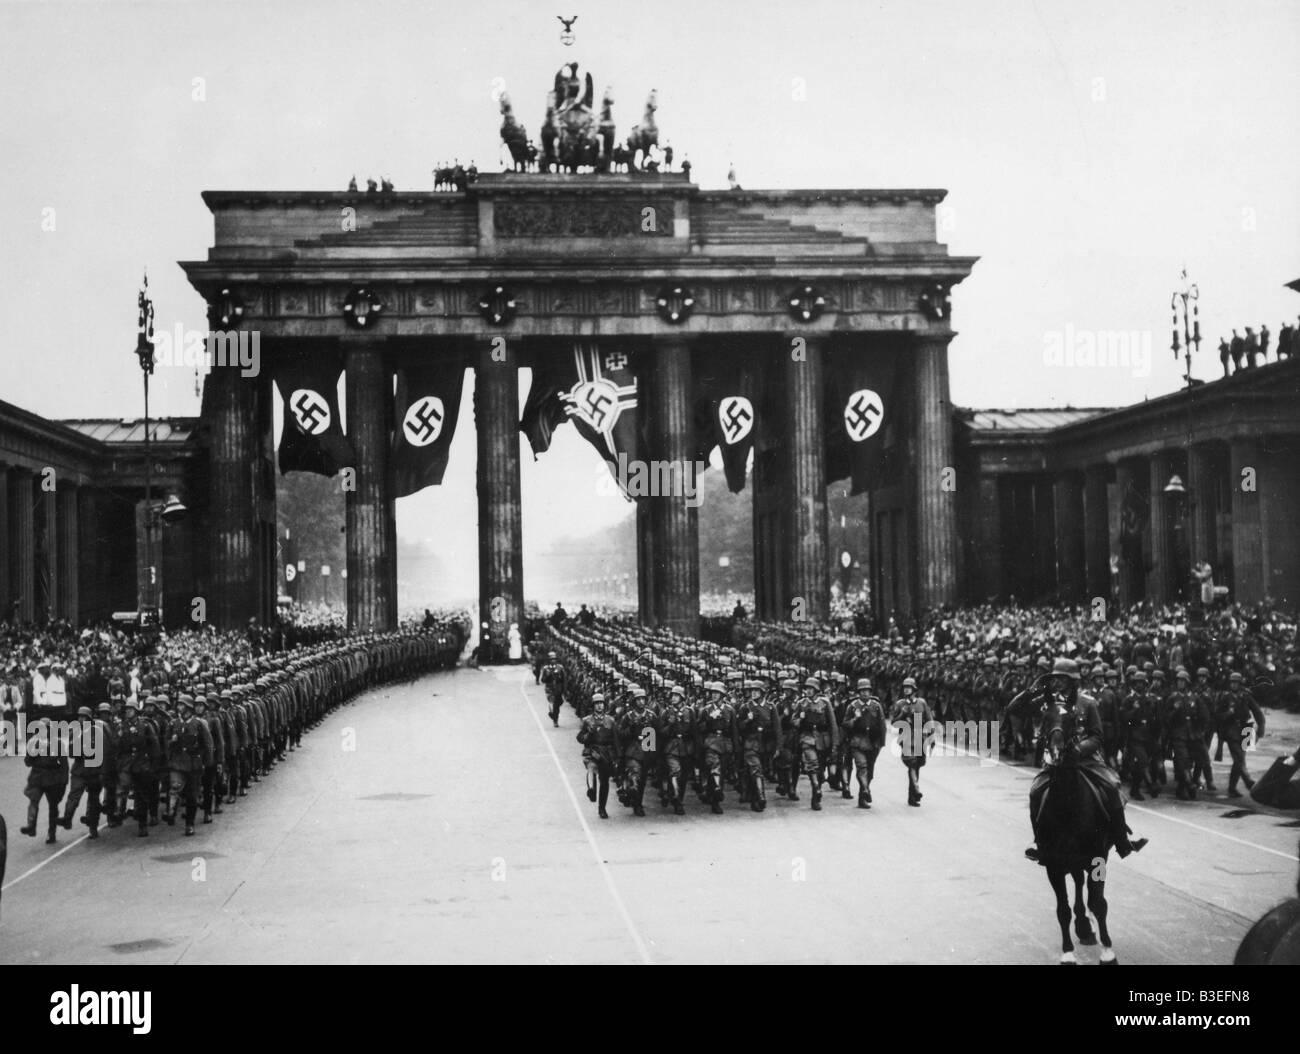 Victory parade / Berlin / 1940 - Stock Image